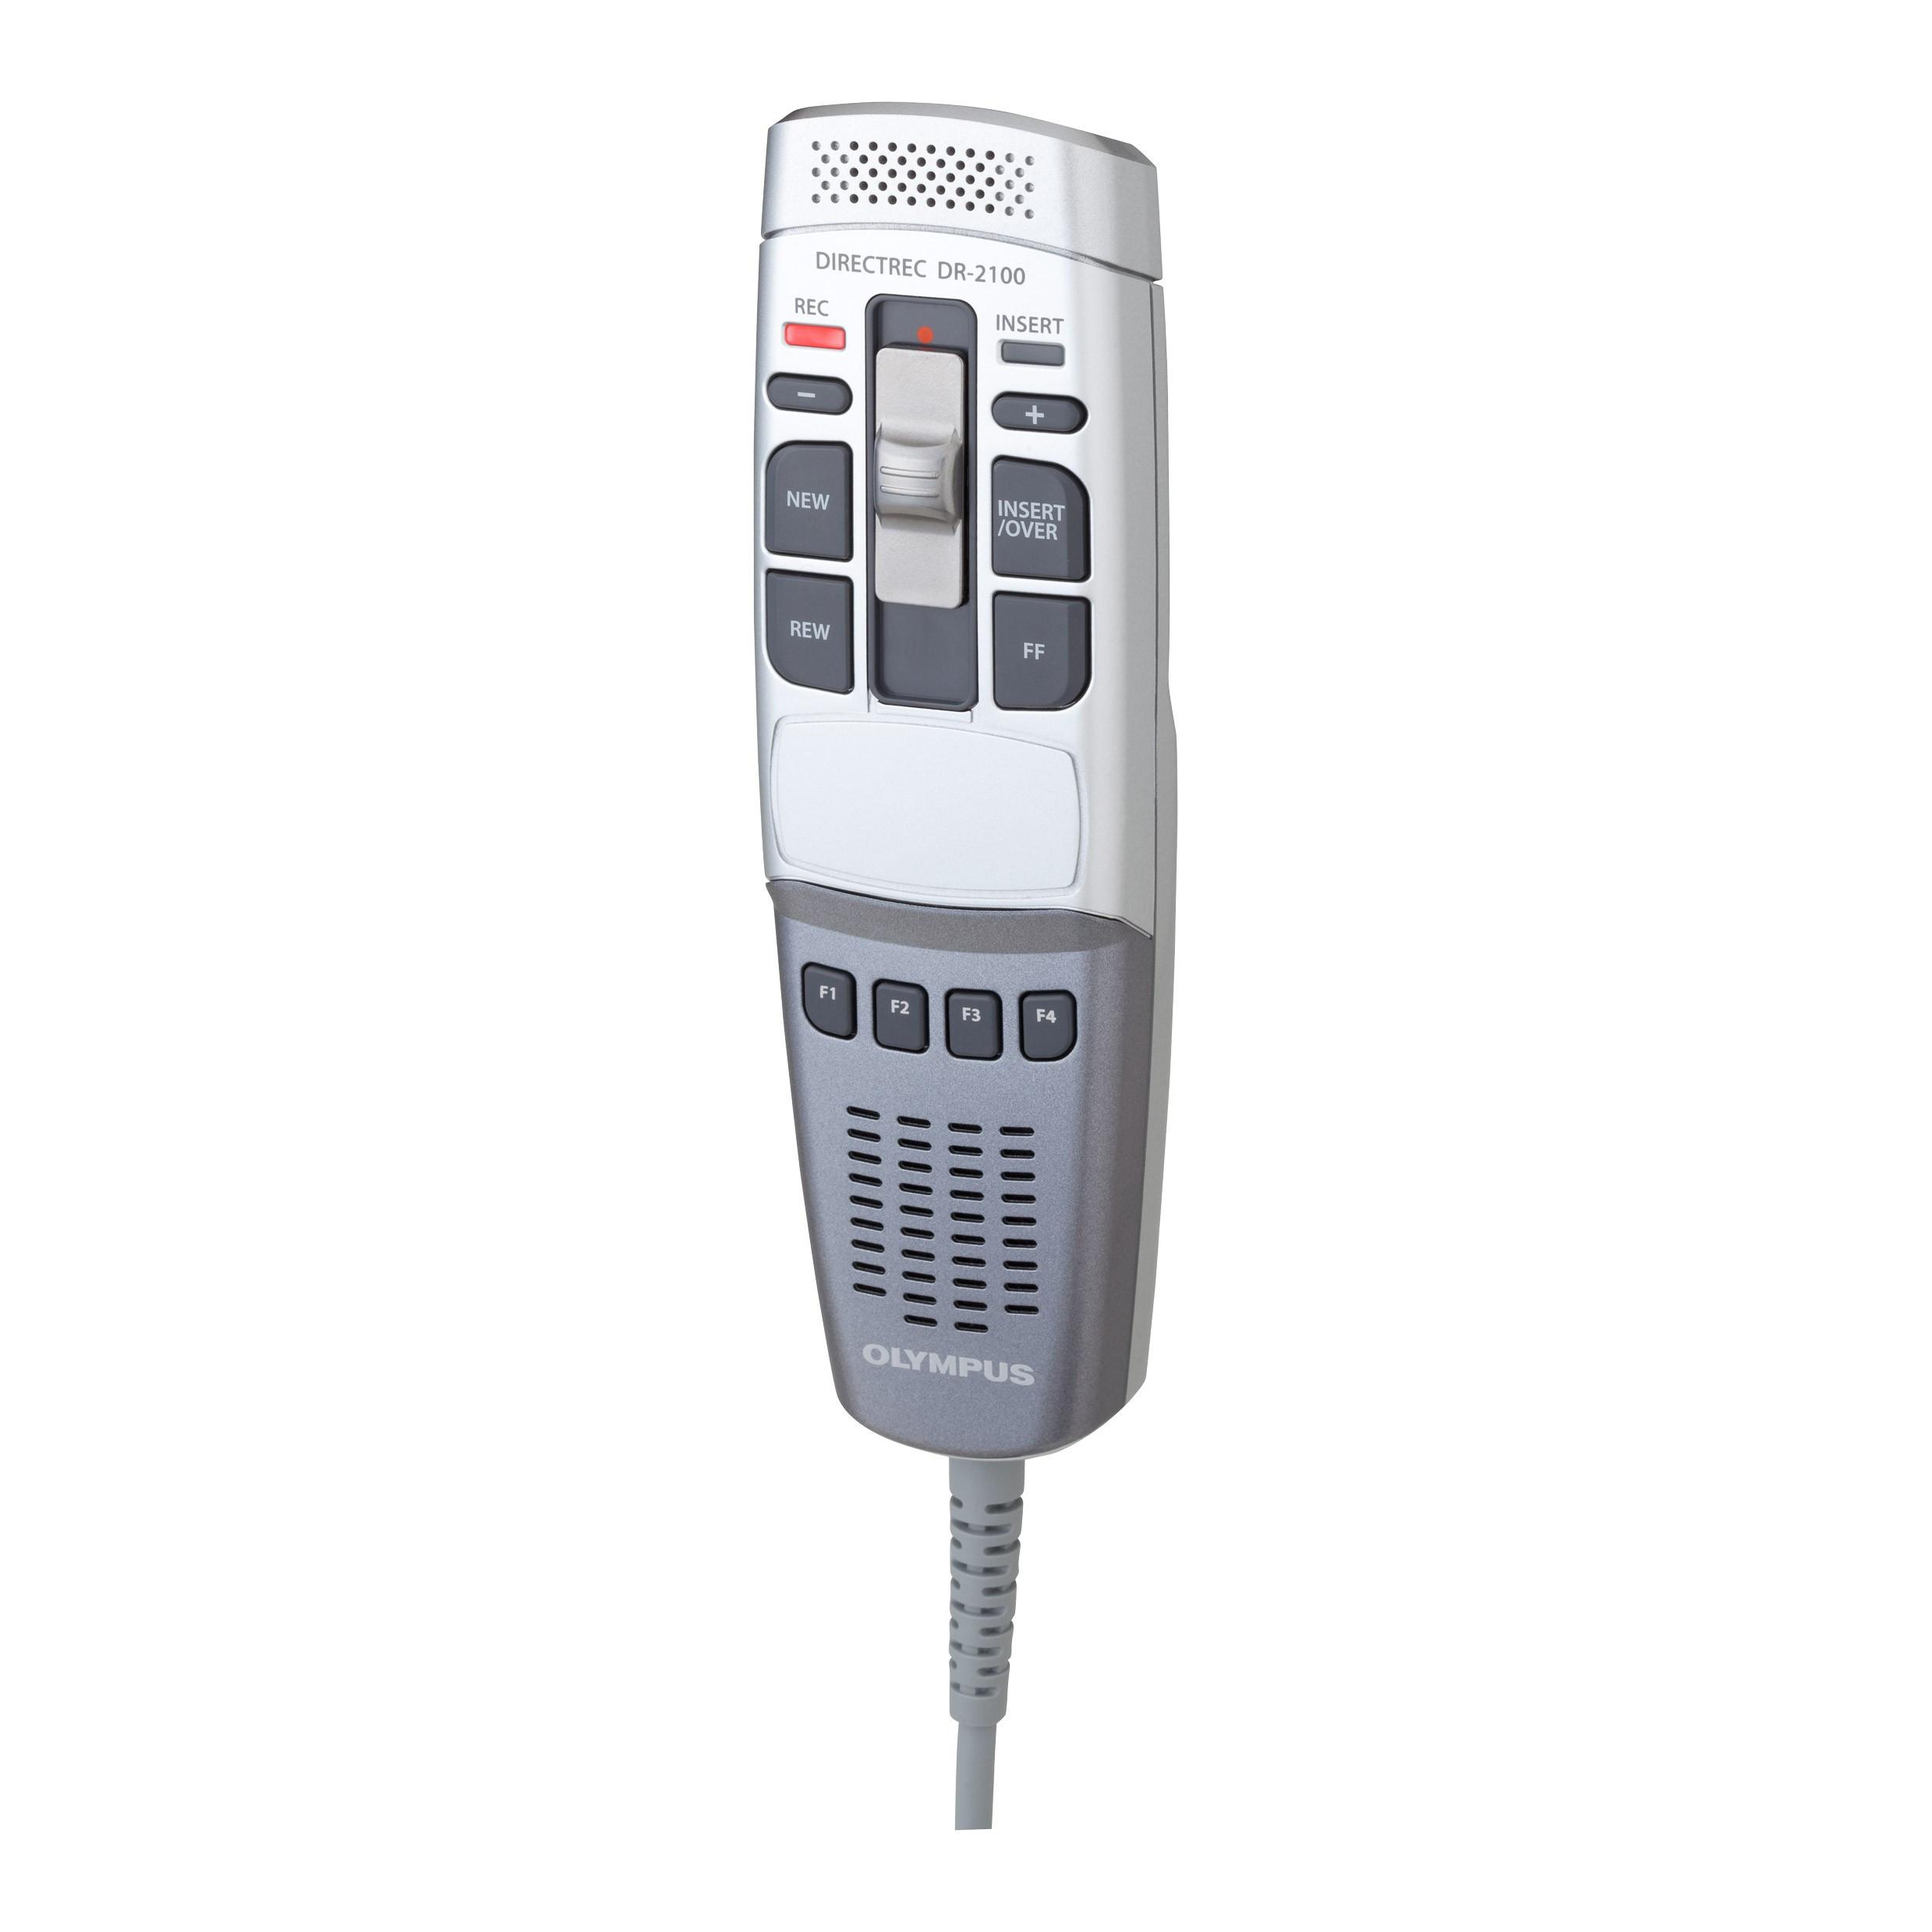 Olympus DR-2100 integrator